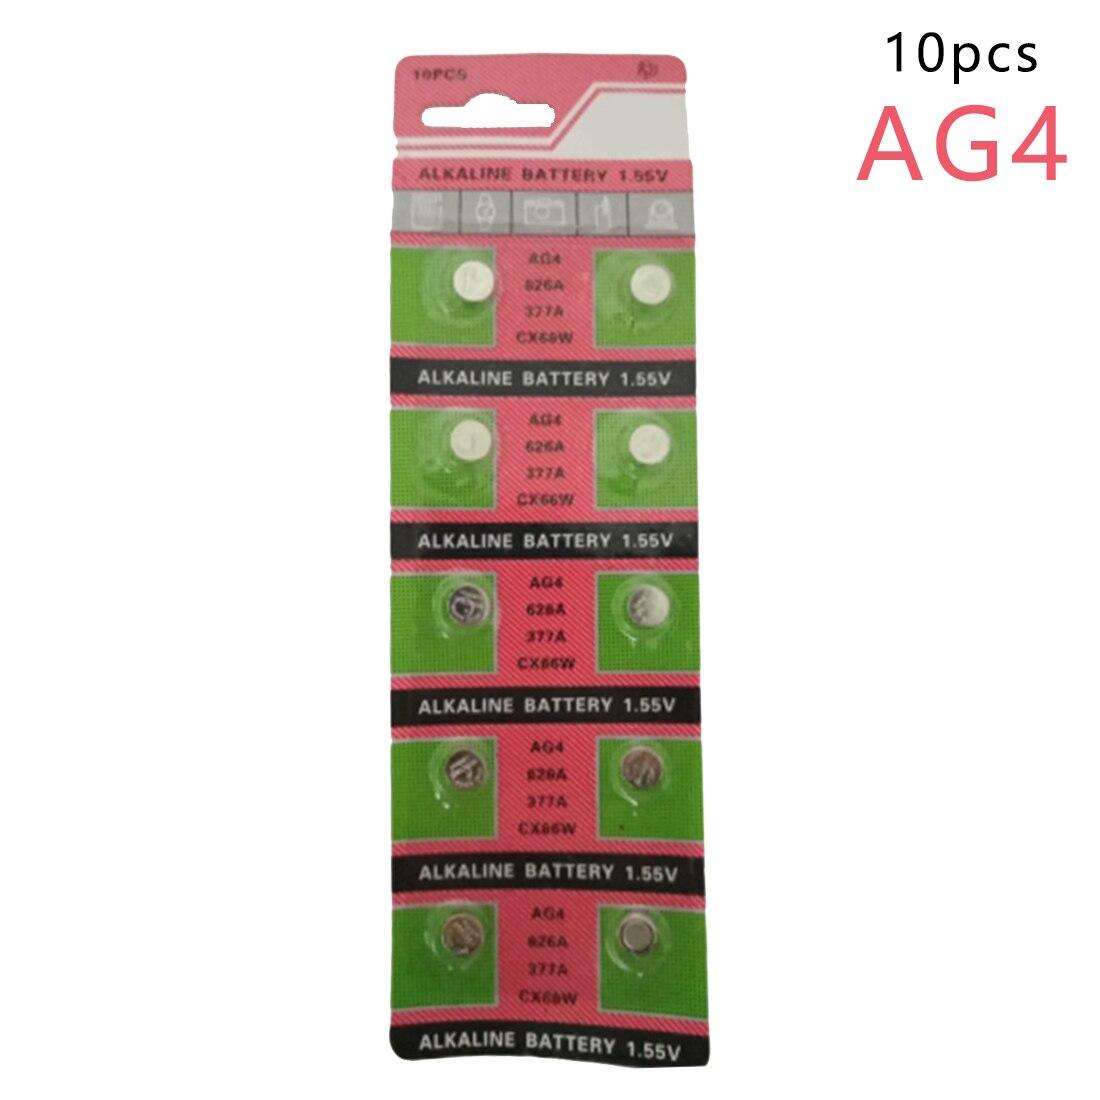 Centechia Wholesale 10PCS/lot =1cards AG4 377A 377 LR626 SR626SW SR66 LR66 button cell Watch Coin Battery 10pcs lot retail brand new renata long lasting 377 sr626sw sr626 v377 ag4 watch battery button coin cell swiss made 100